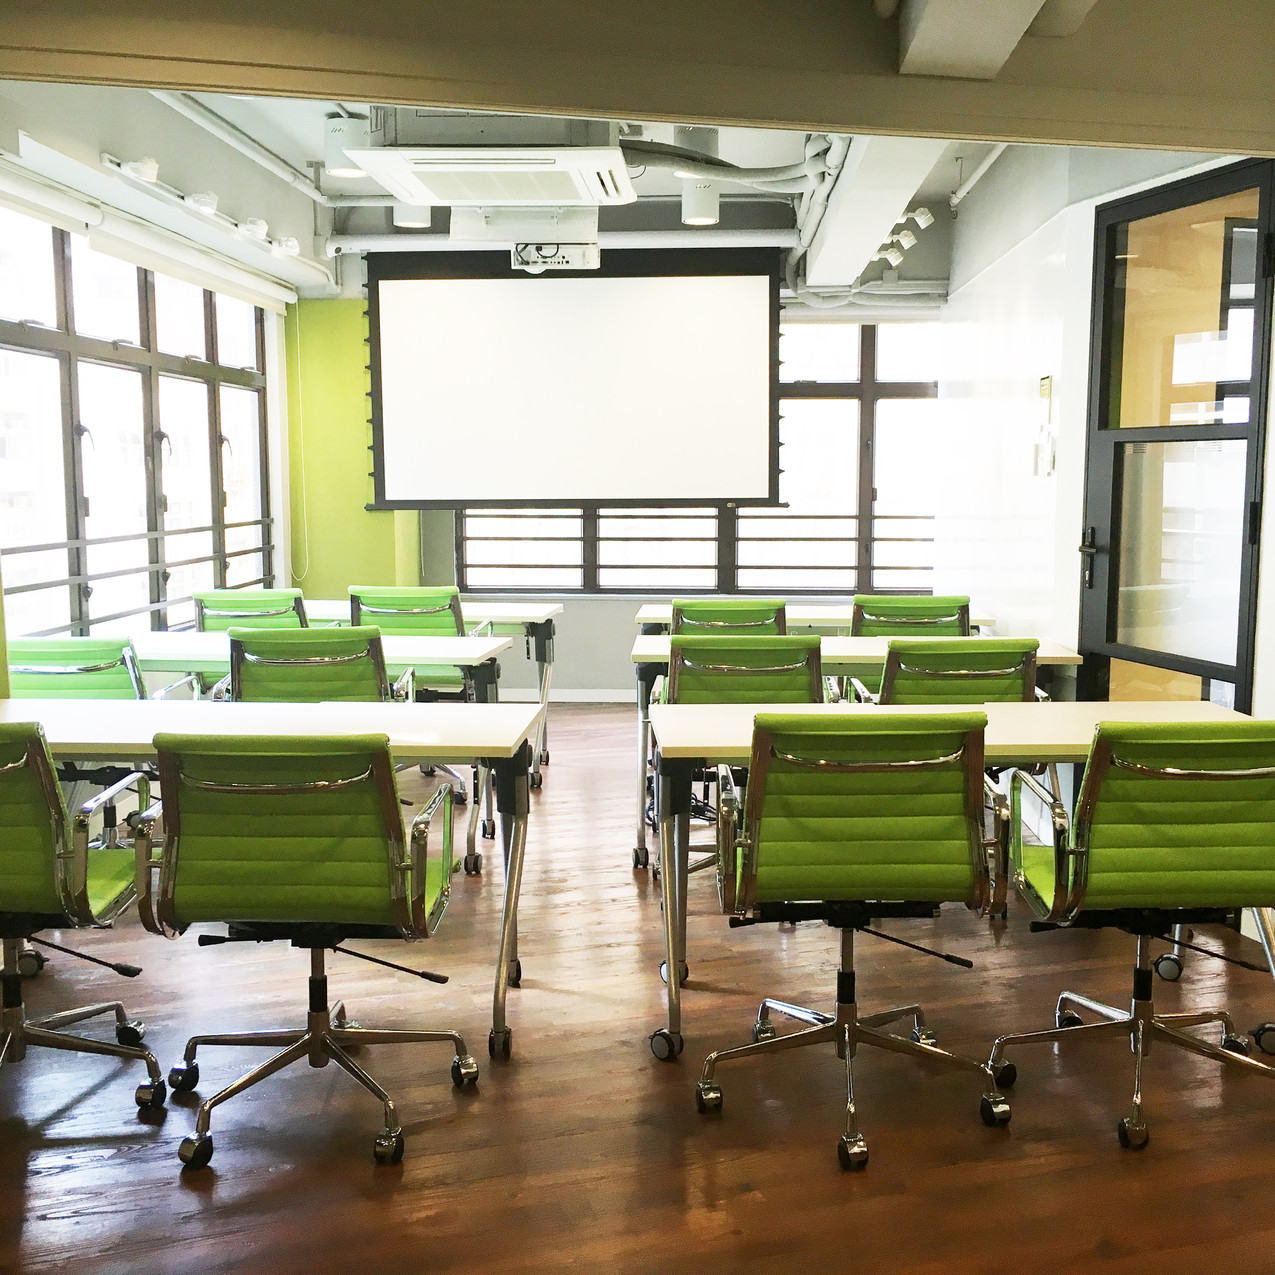 Pic 10 - Meeting room